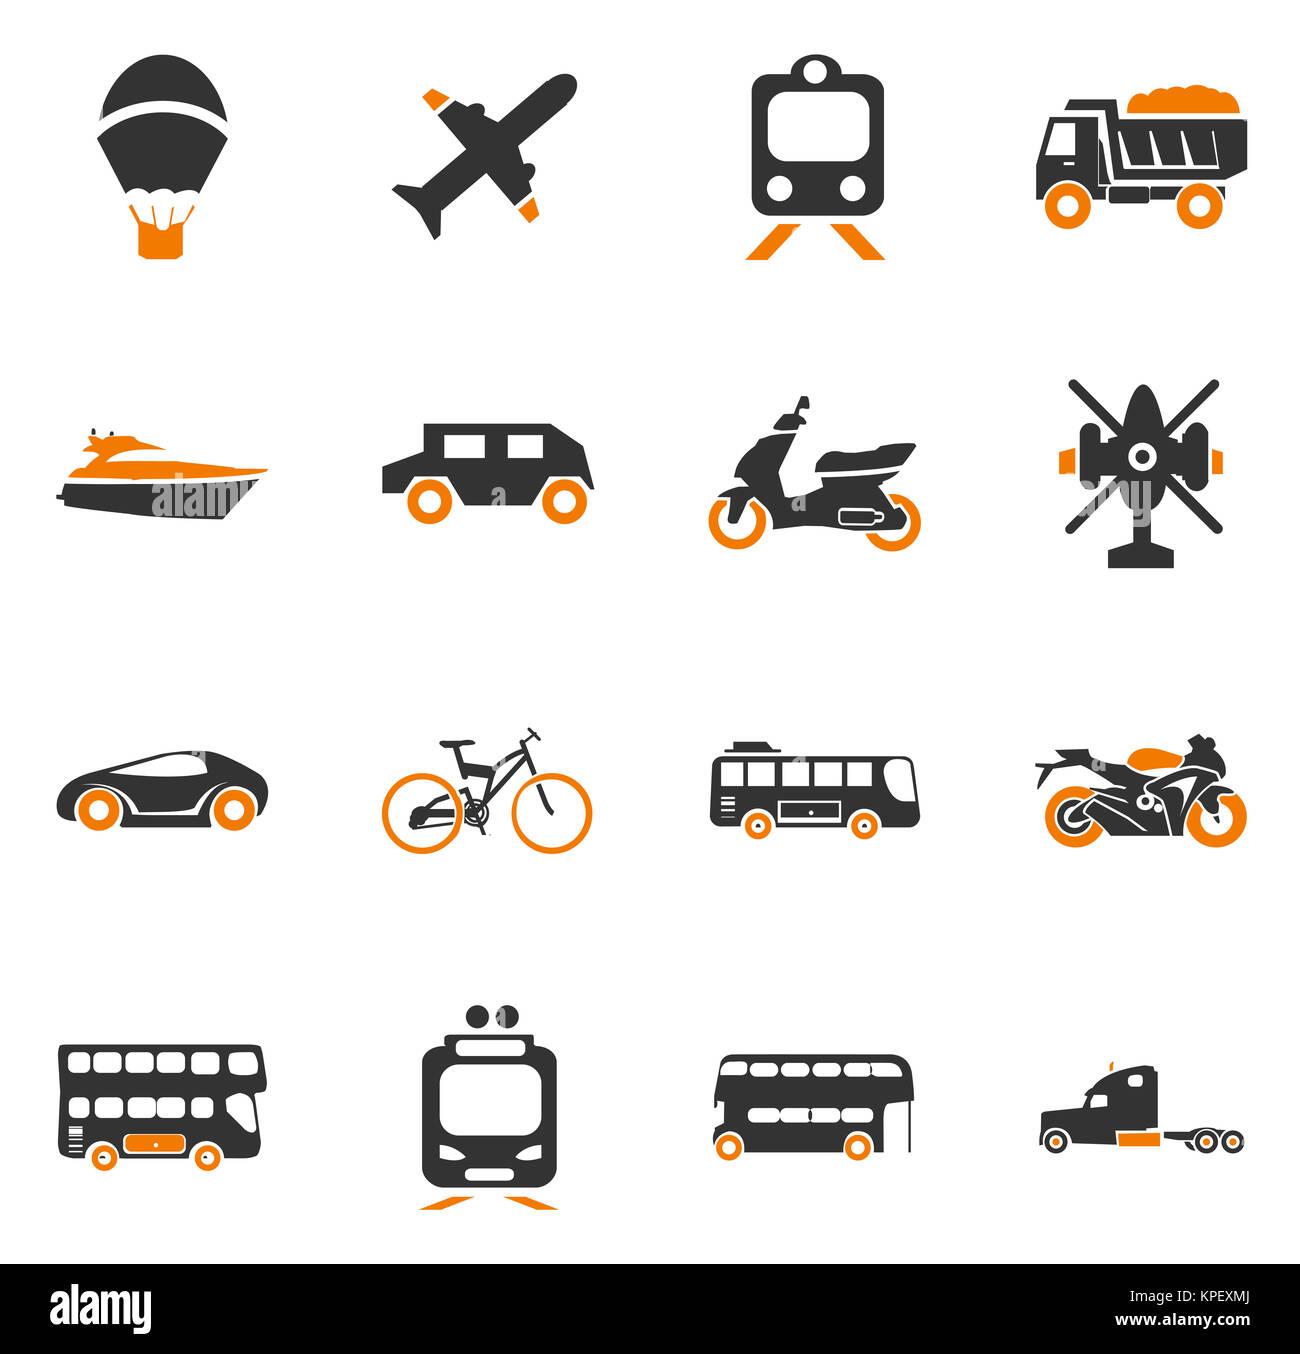 Transport types icons set - Stock Image